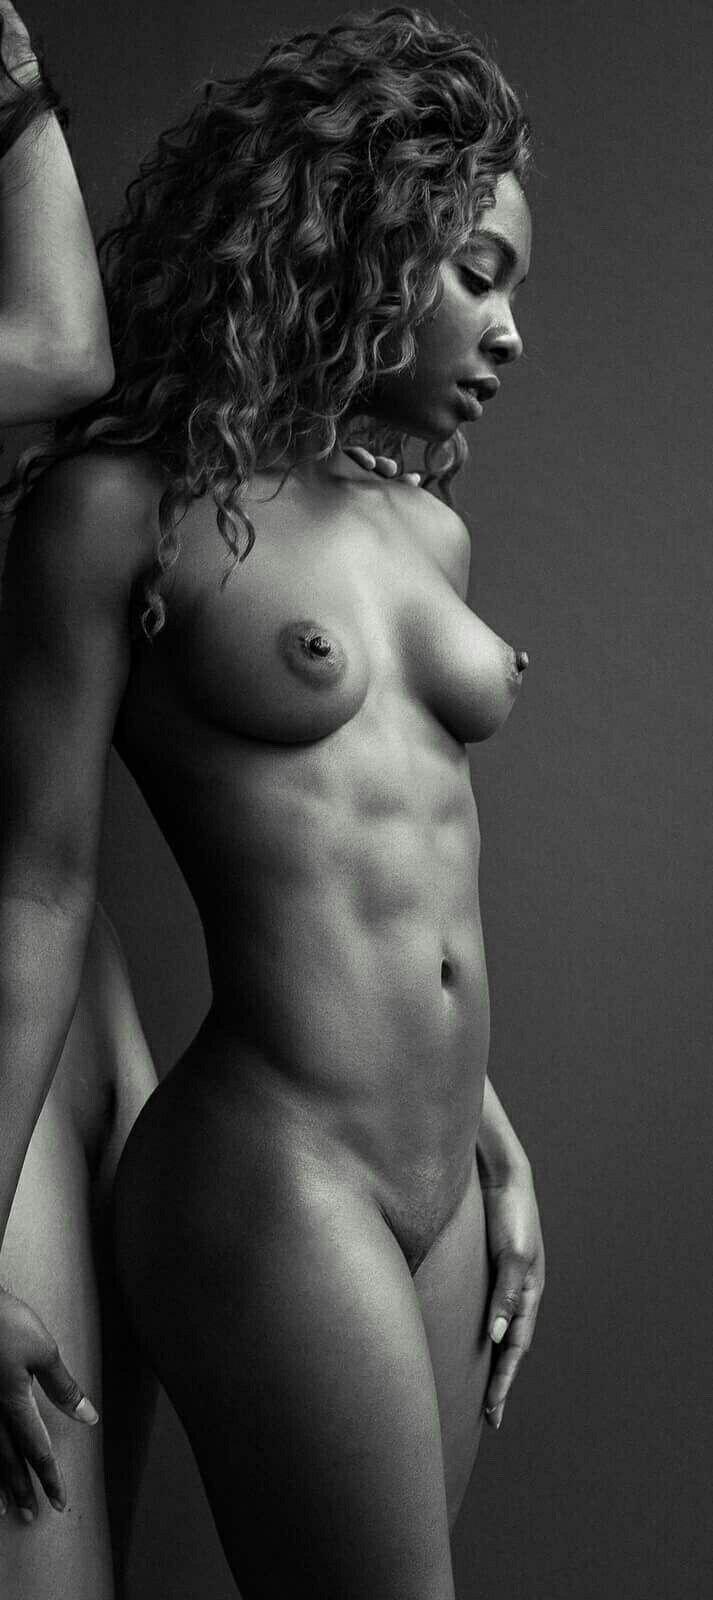 buff black women naked